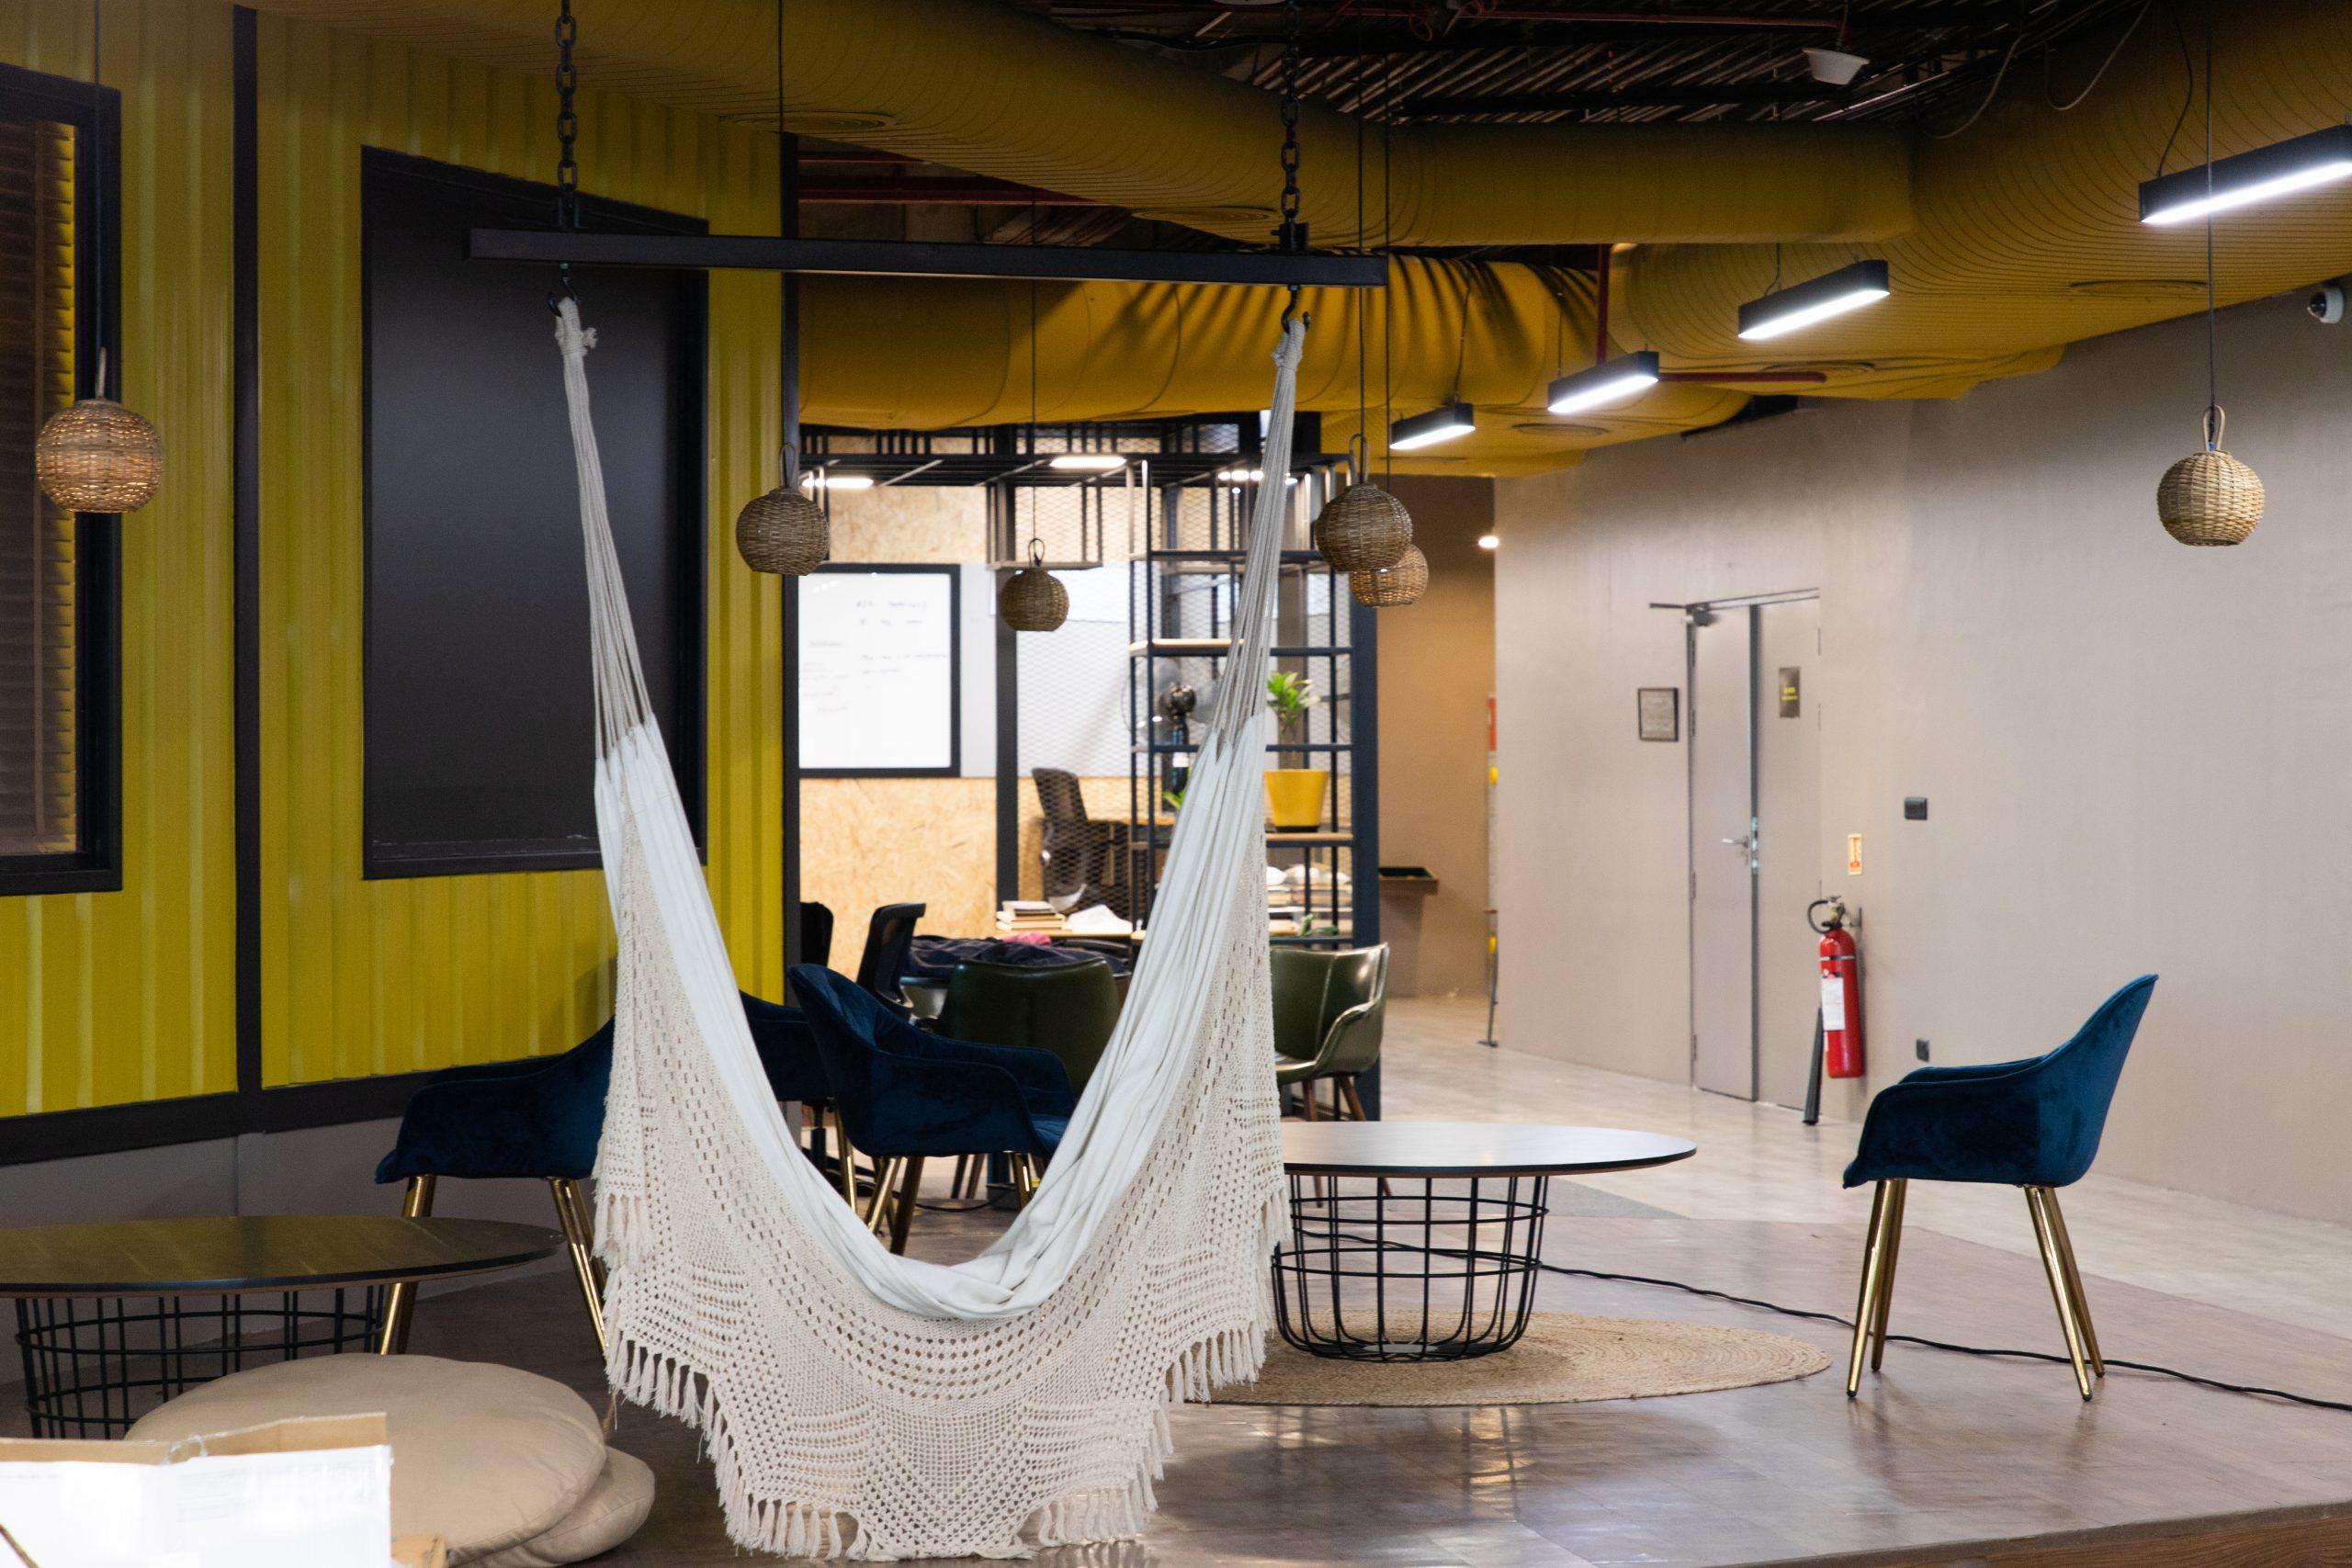 Office hangout zone